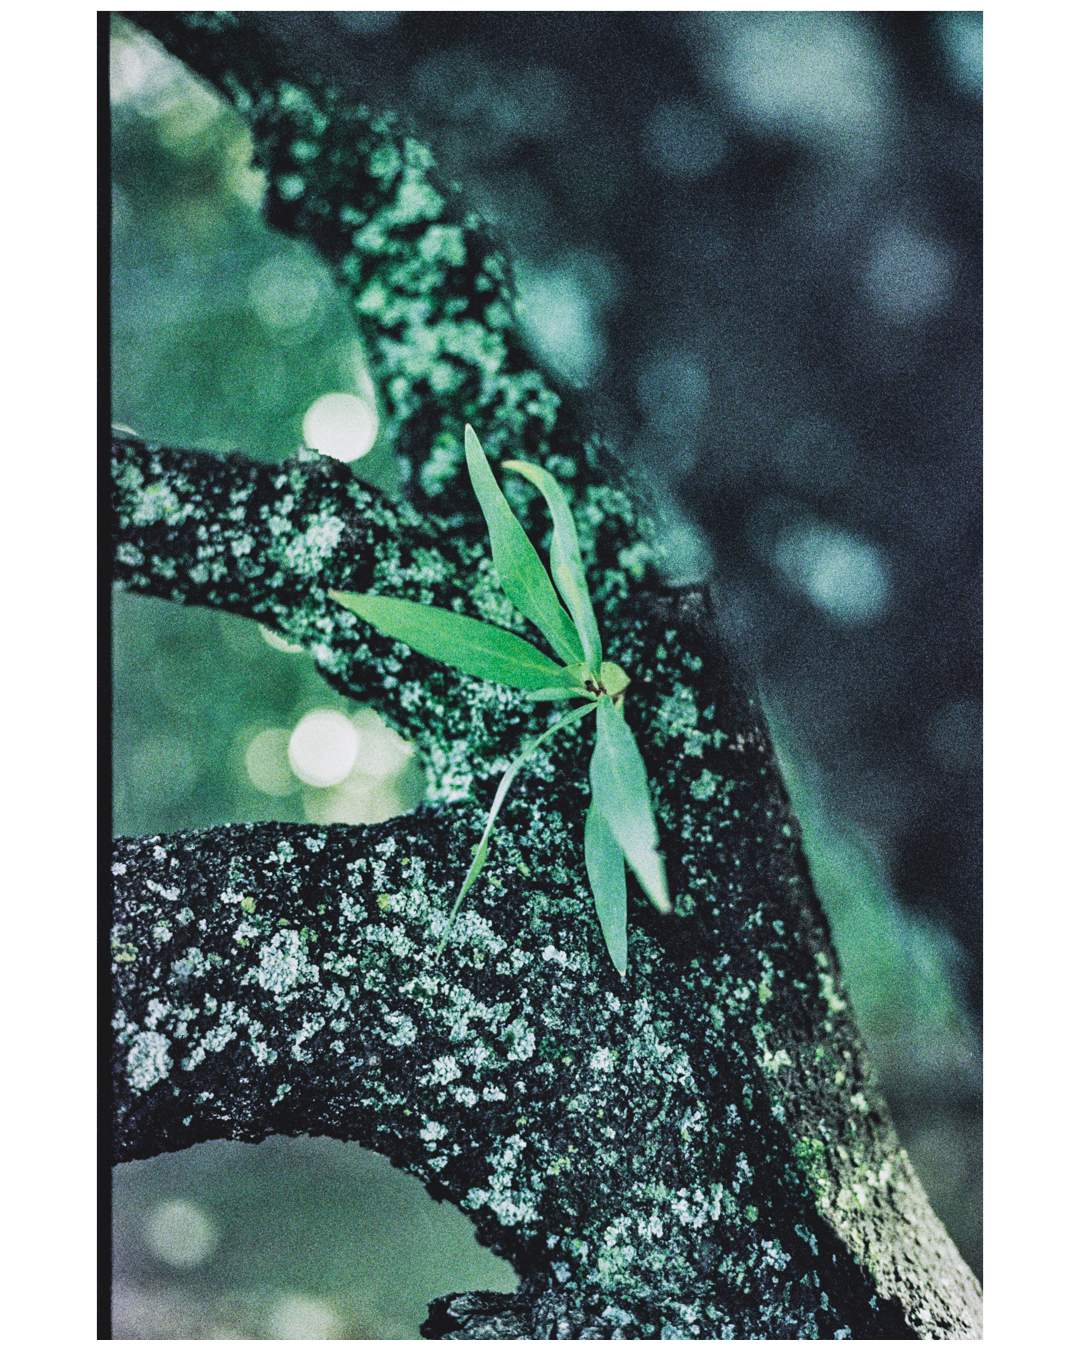 Film Photography Photo Walk 35mm - South Africa - by Ken Treloar Photography-25.jpg